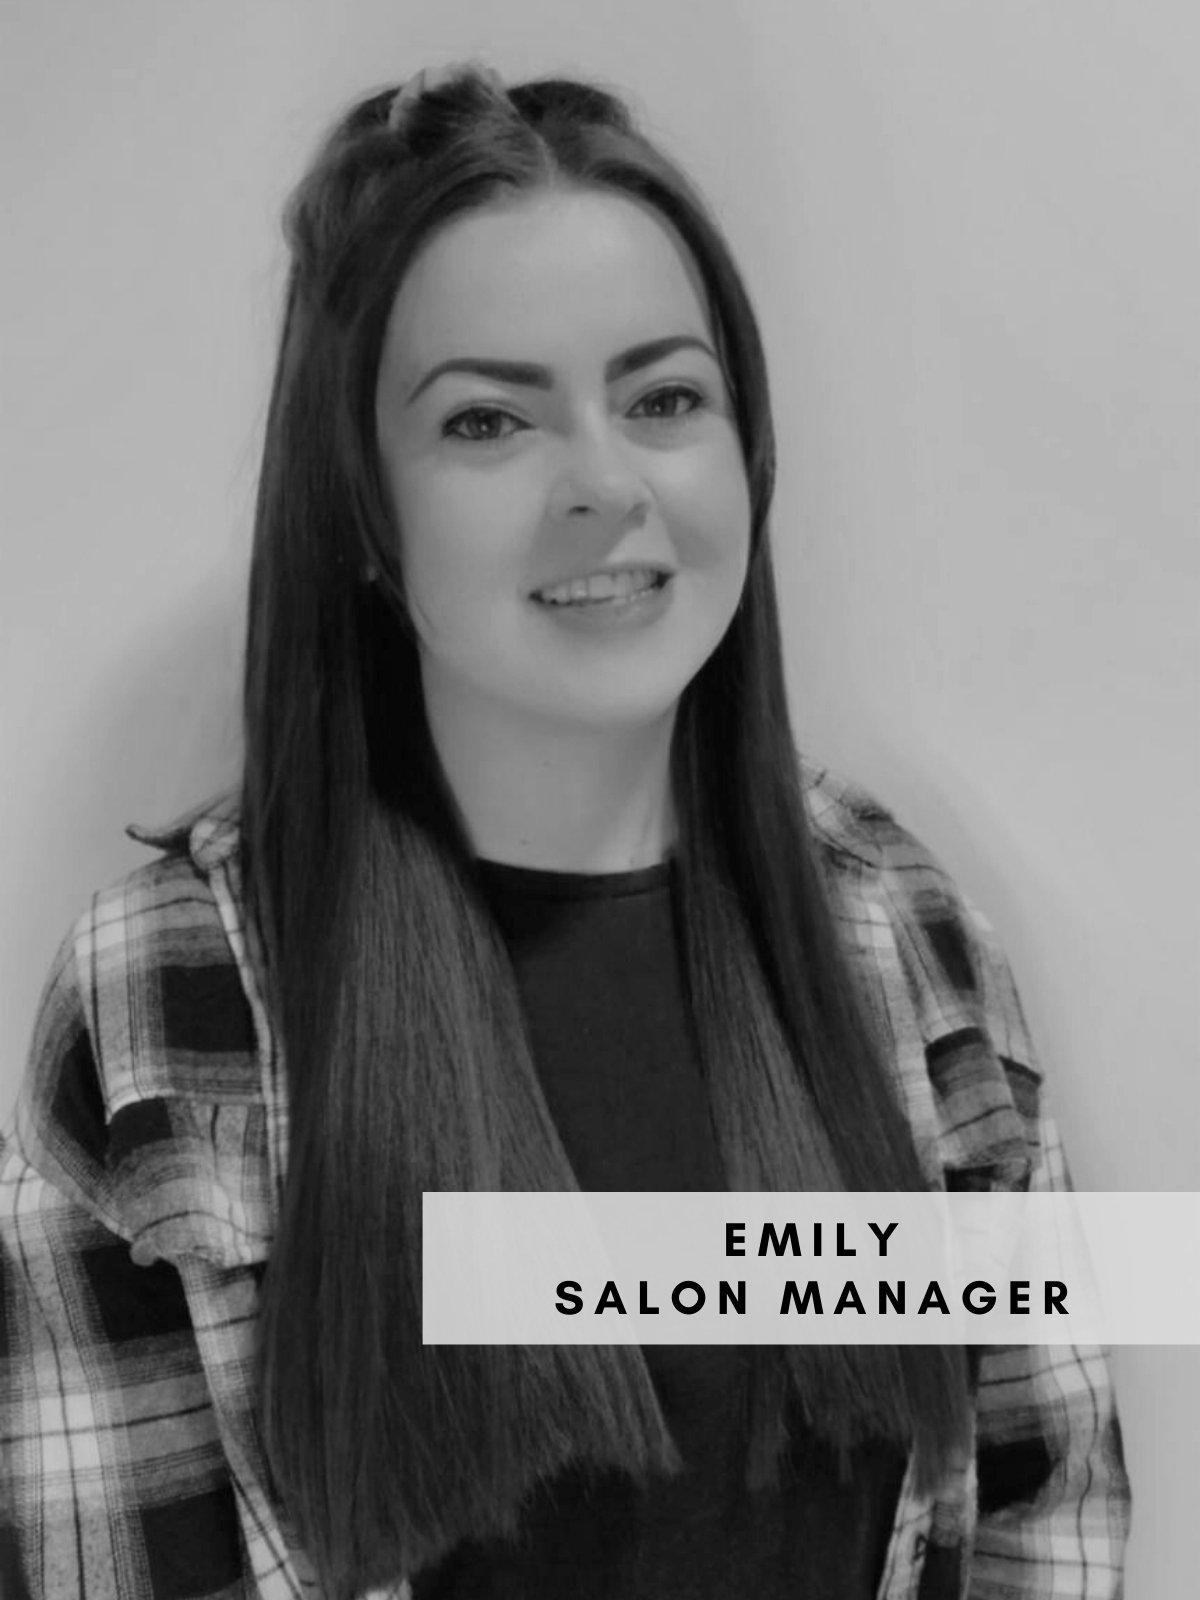 Emily – Salon Manager